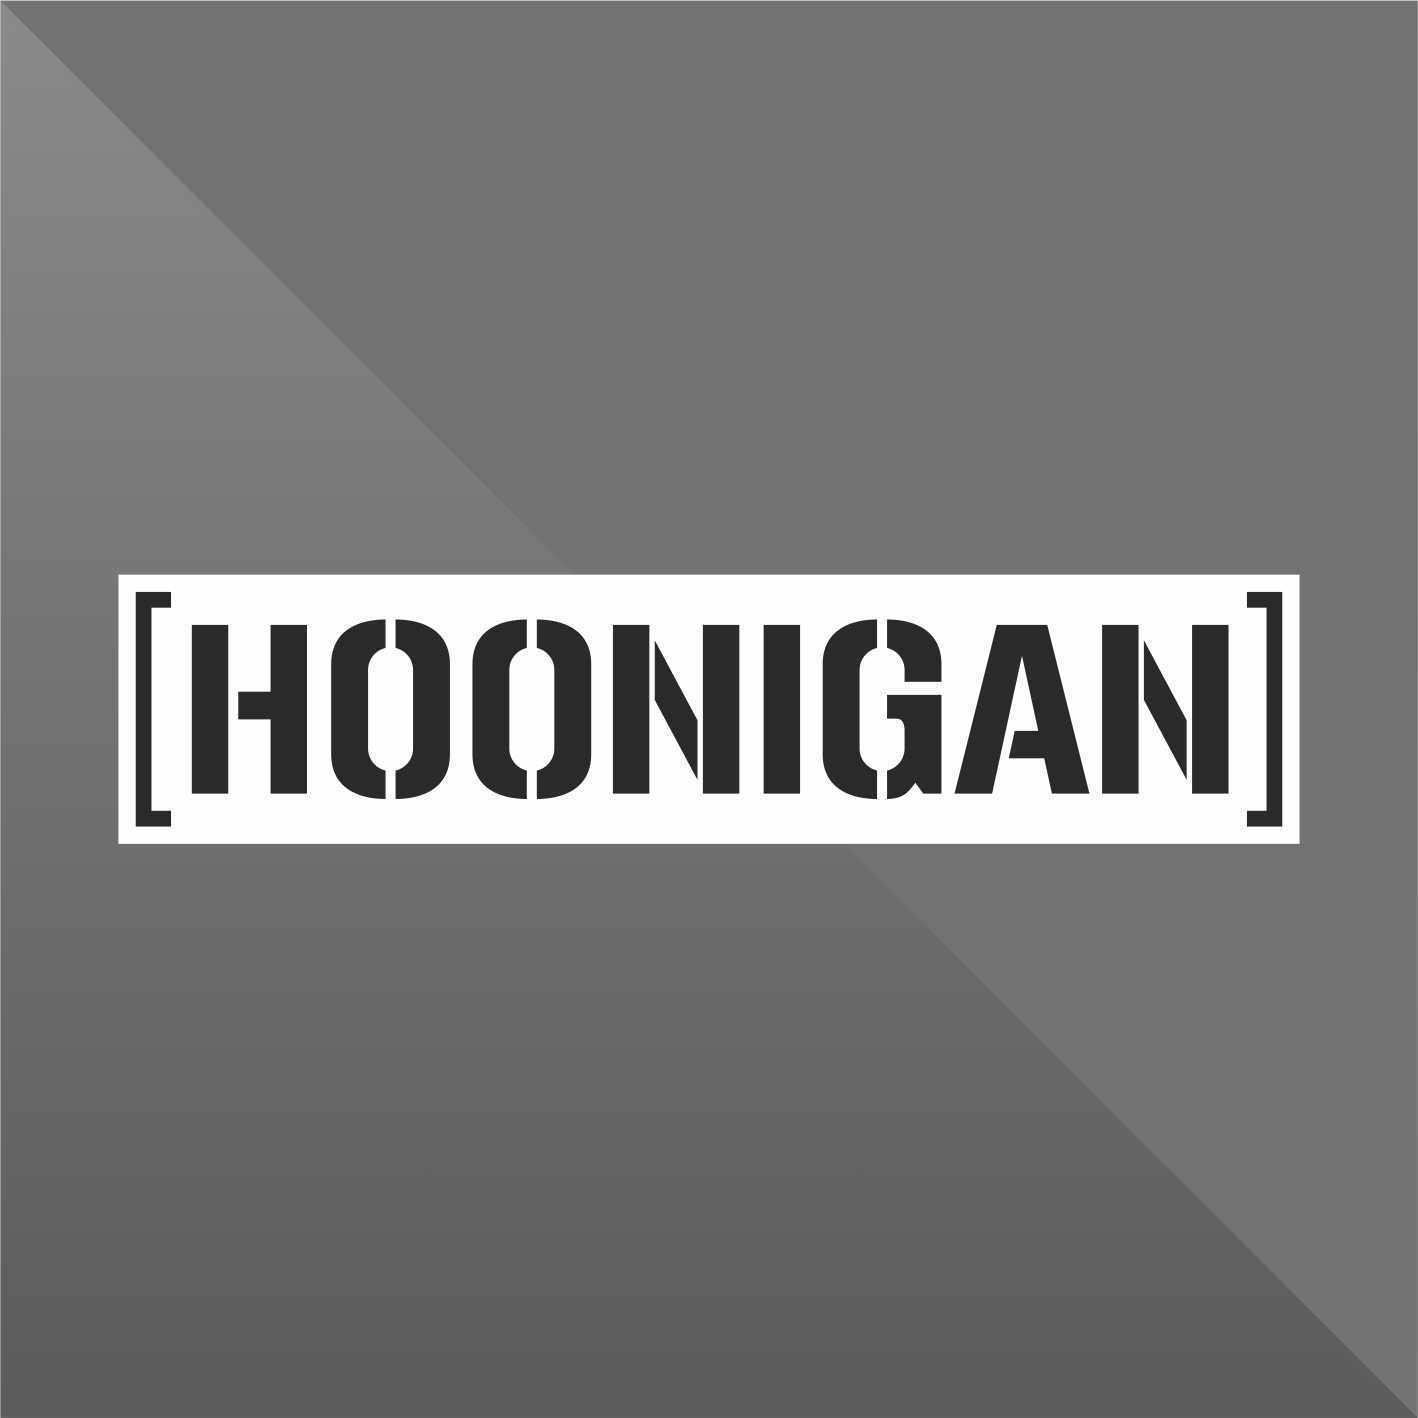 PEGATINA STICKER VINILO Hoonigan autocollant aufkleber adesivi